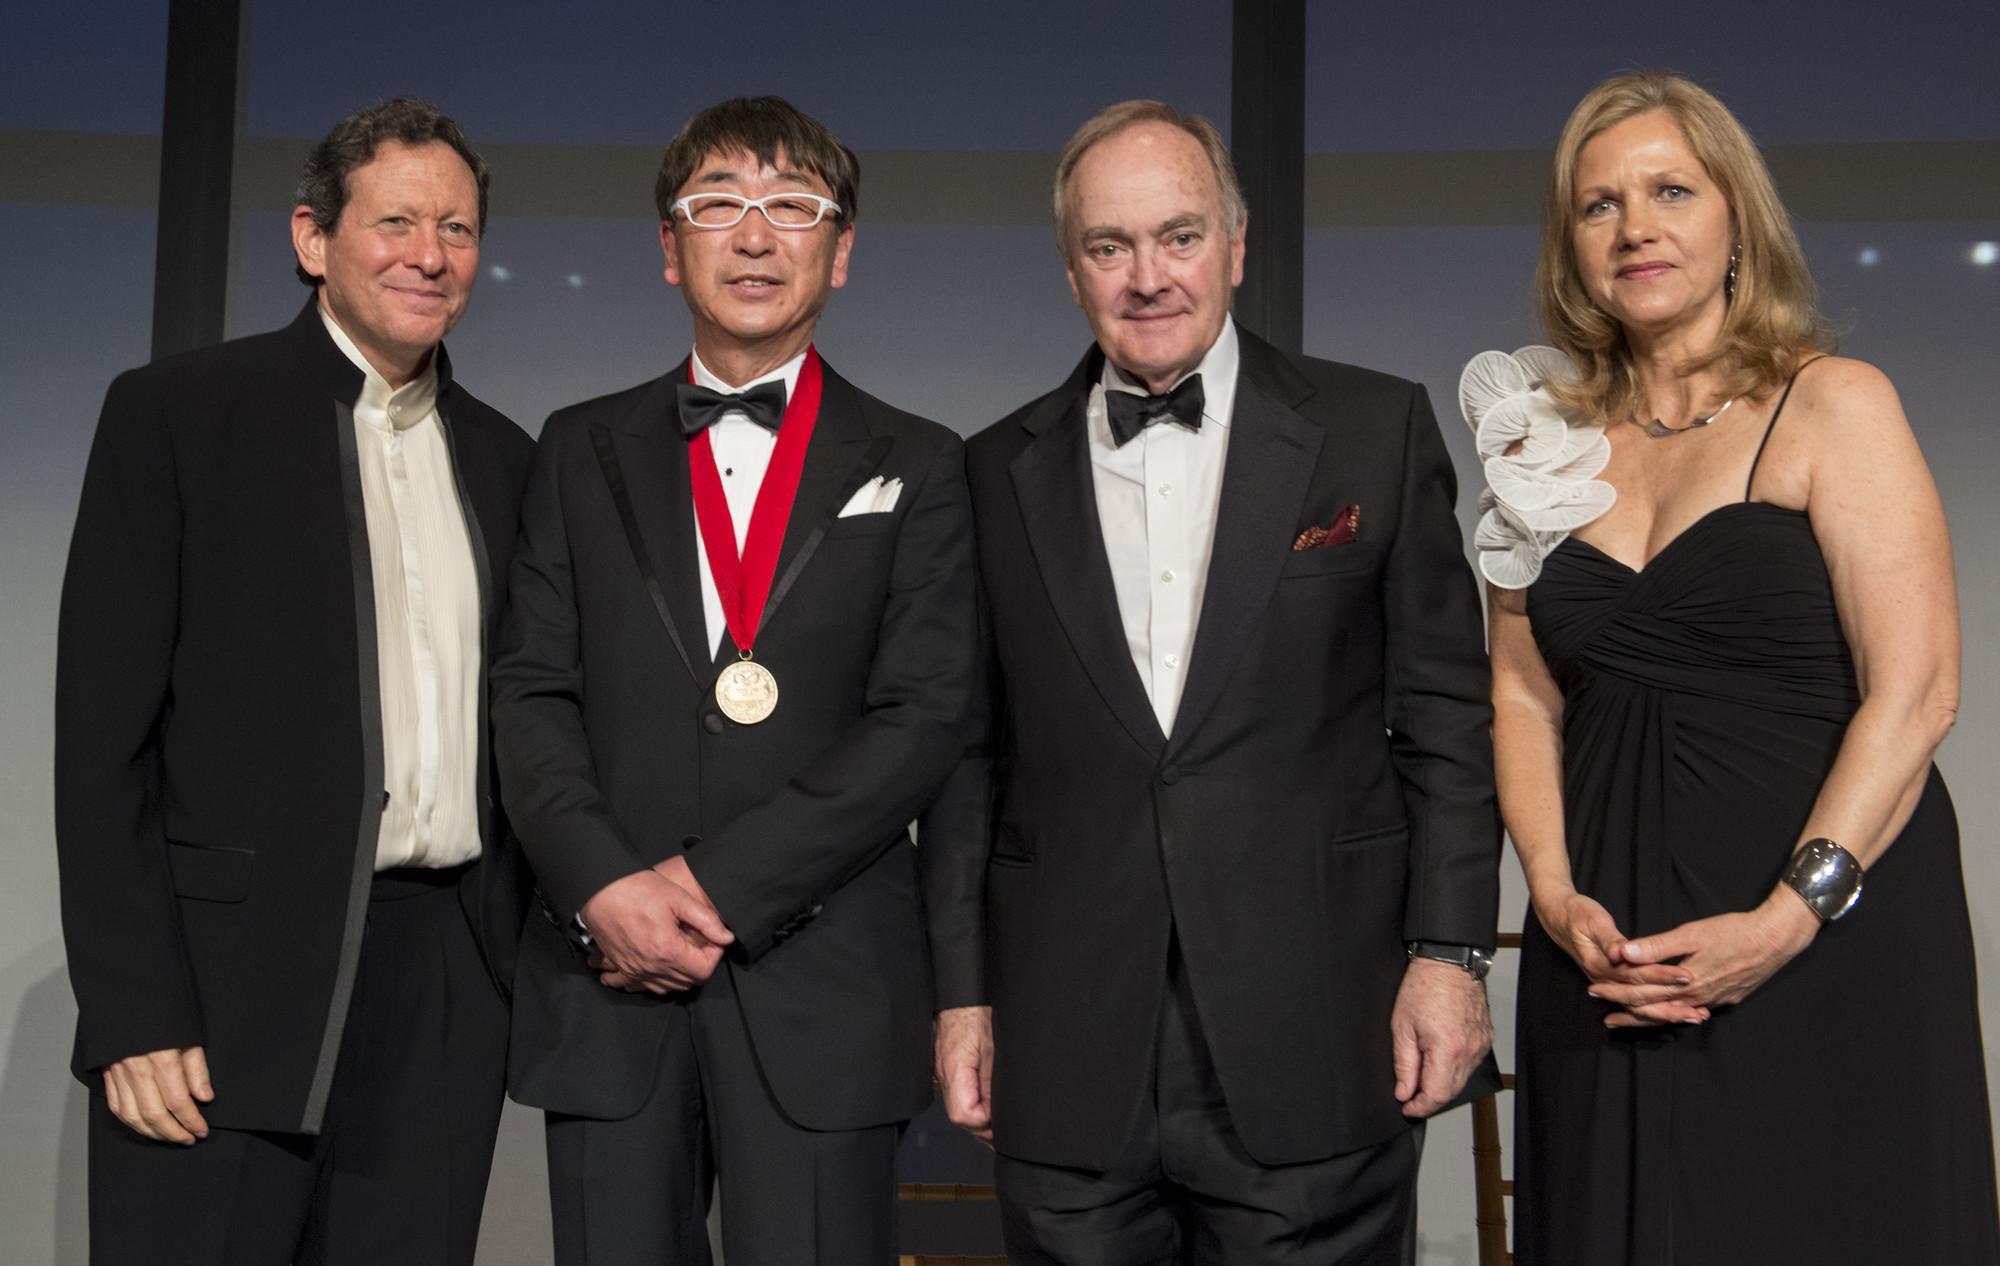 Ceremonia Premio Pritzker 2013, Toyo Ito, Thomas Pritzker, Toyo Ito, Lord Palumbo, Martha Thorn